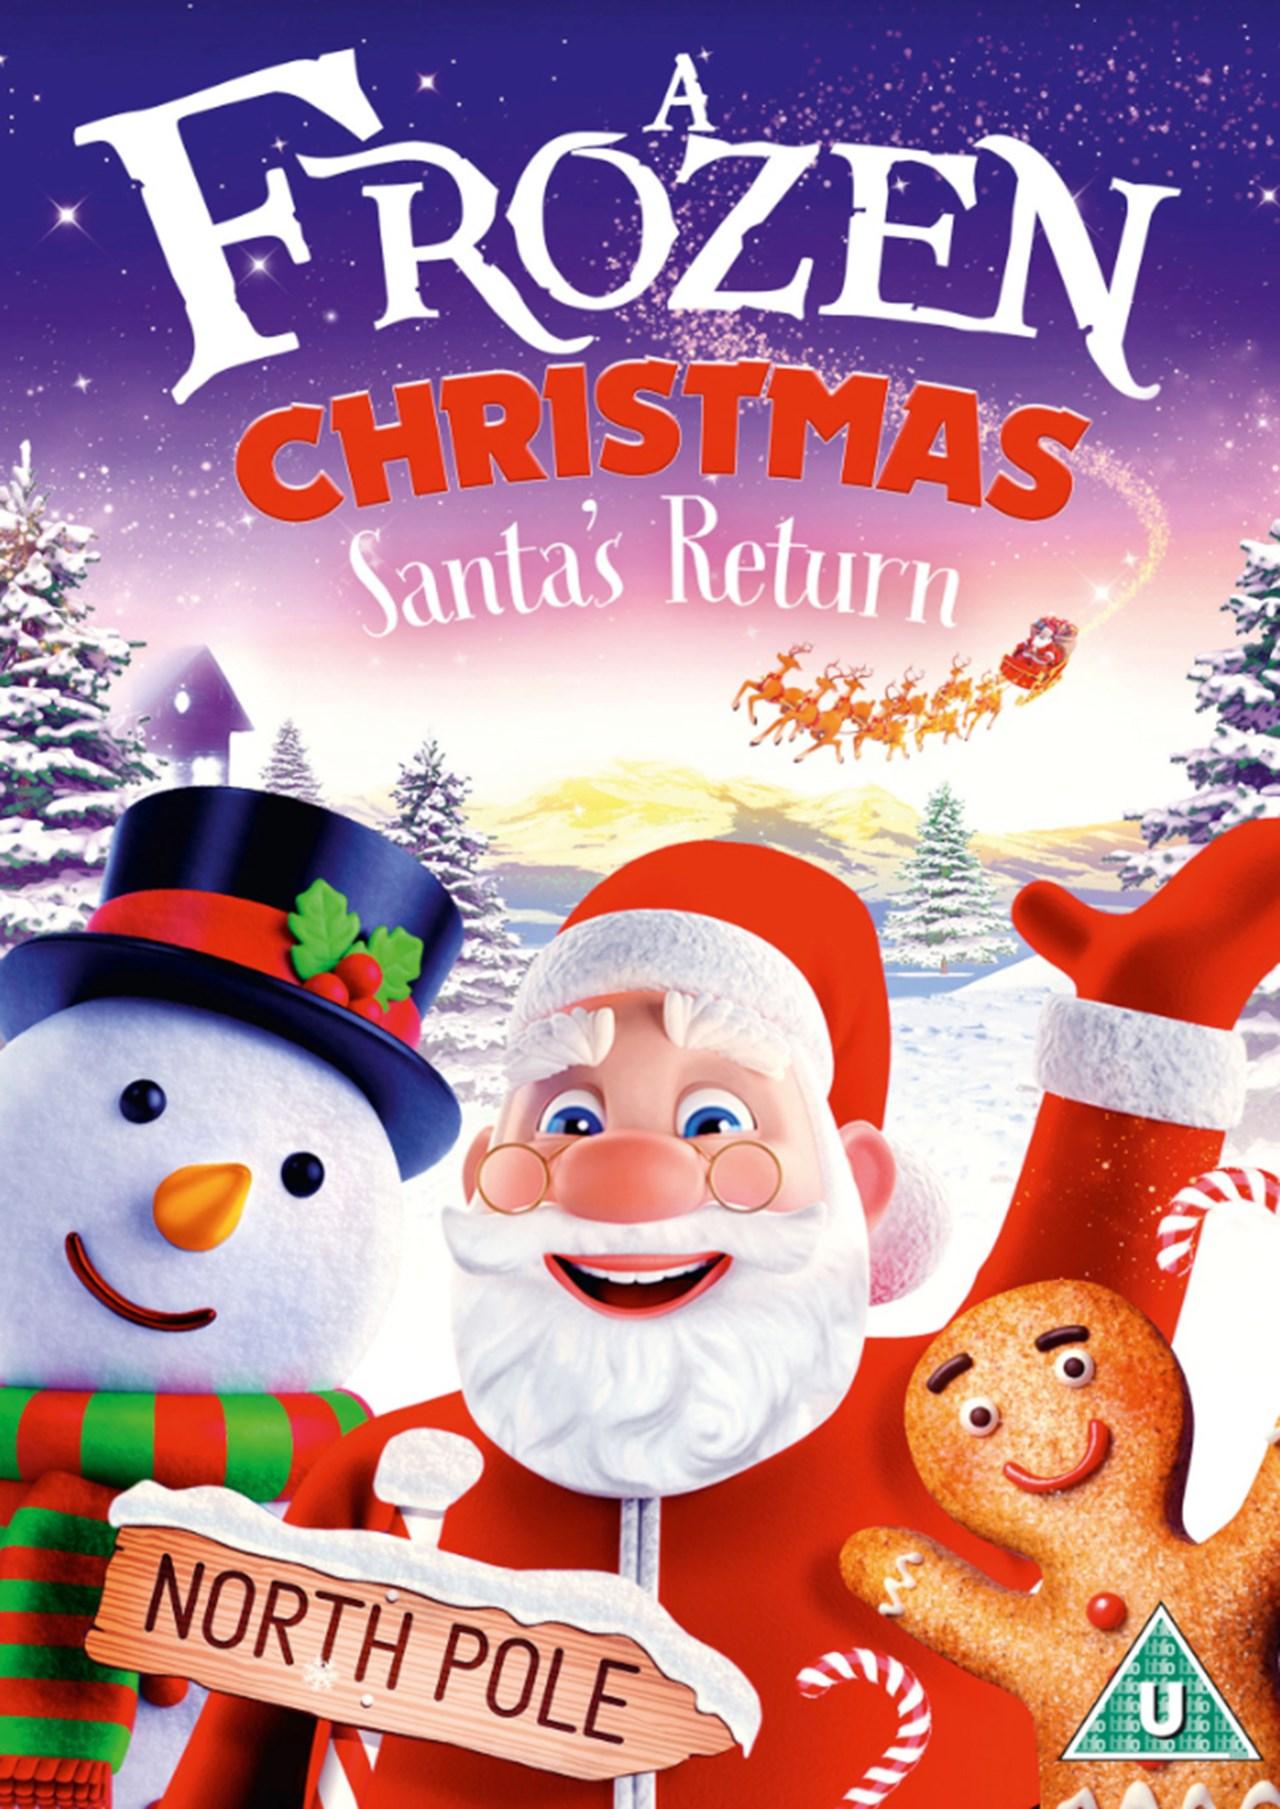 A Frozen Christmas: Santa's Return - 1